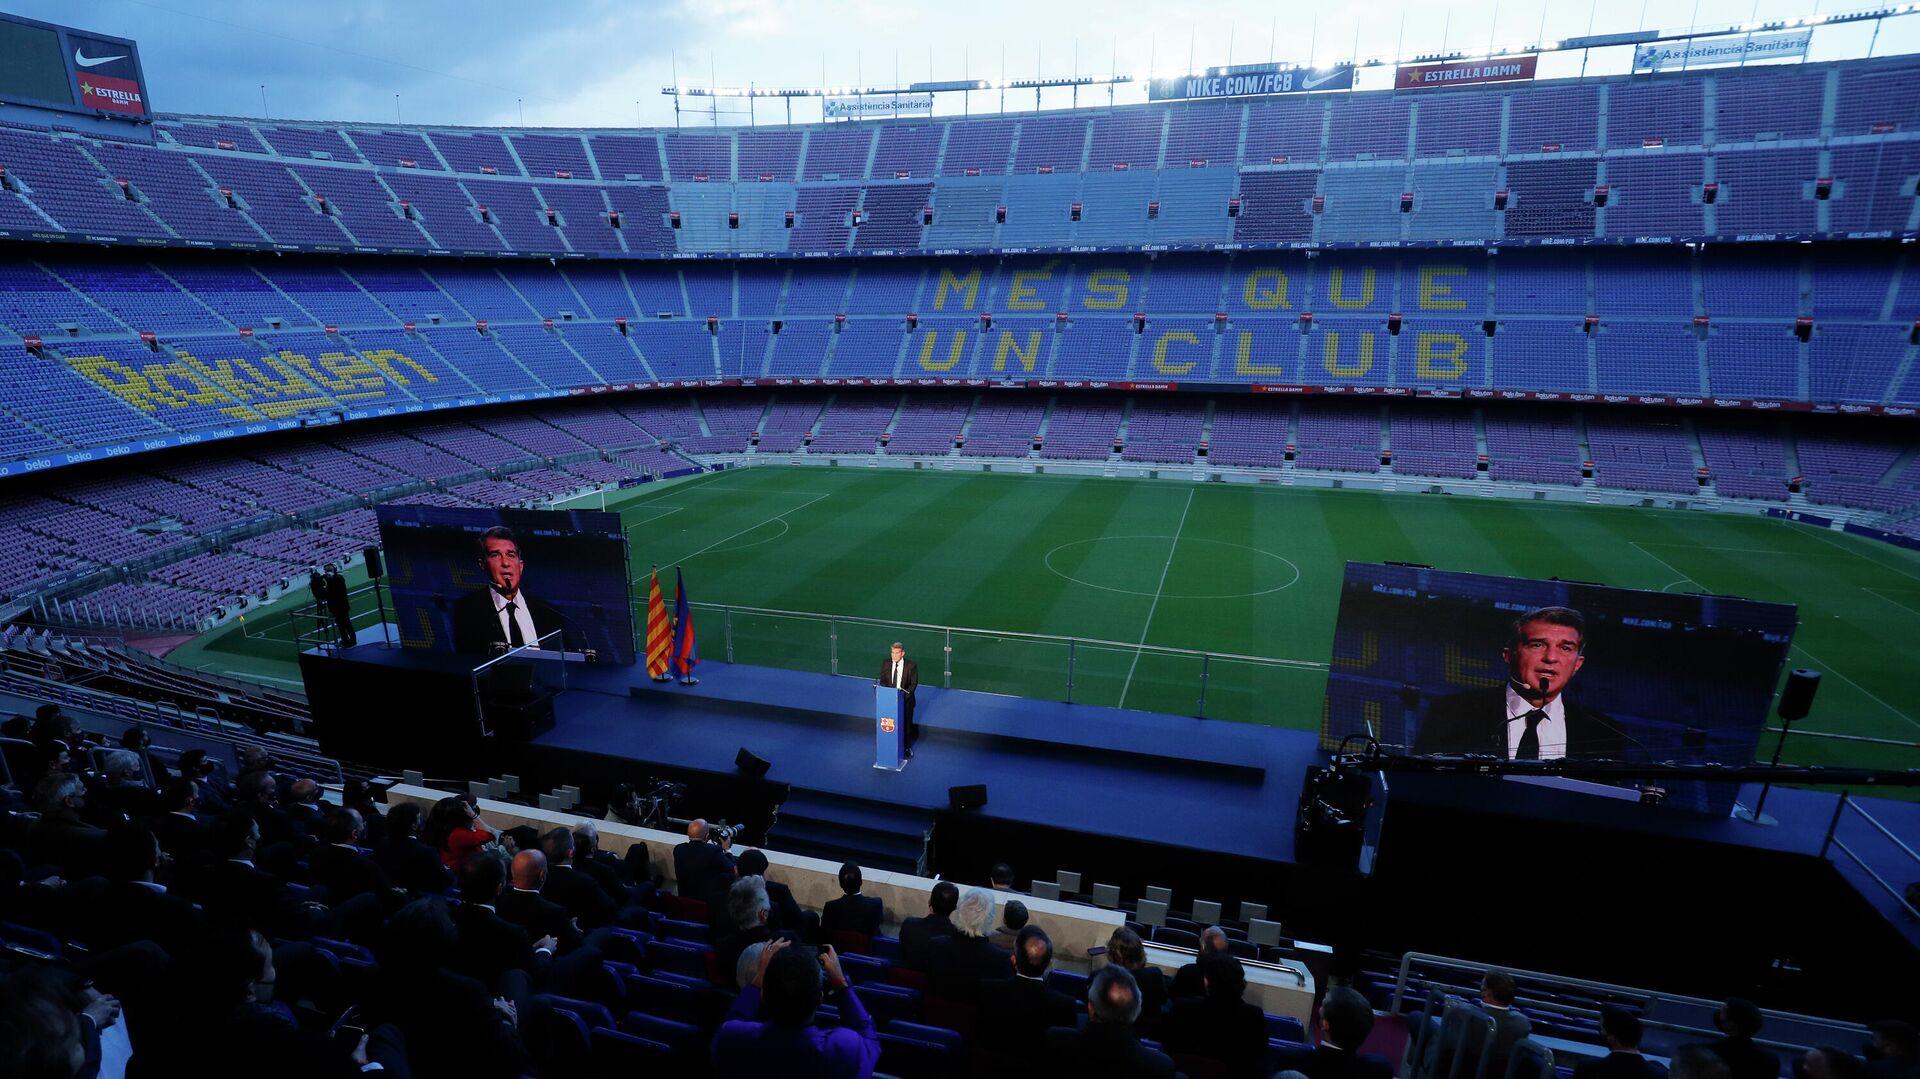 El estadio del Camp Nou - Sputnik Mundo, 1920, 23.03.2021